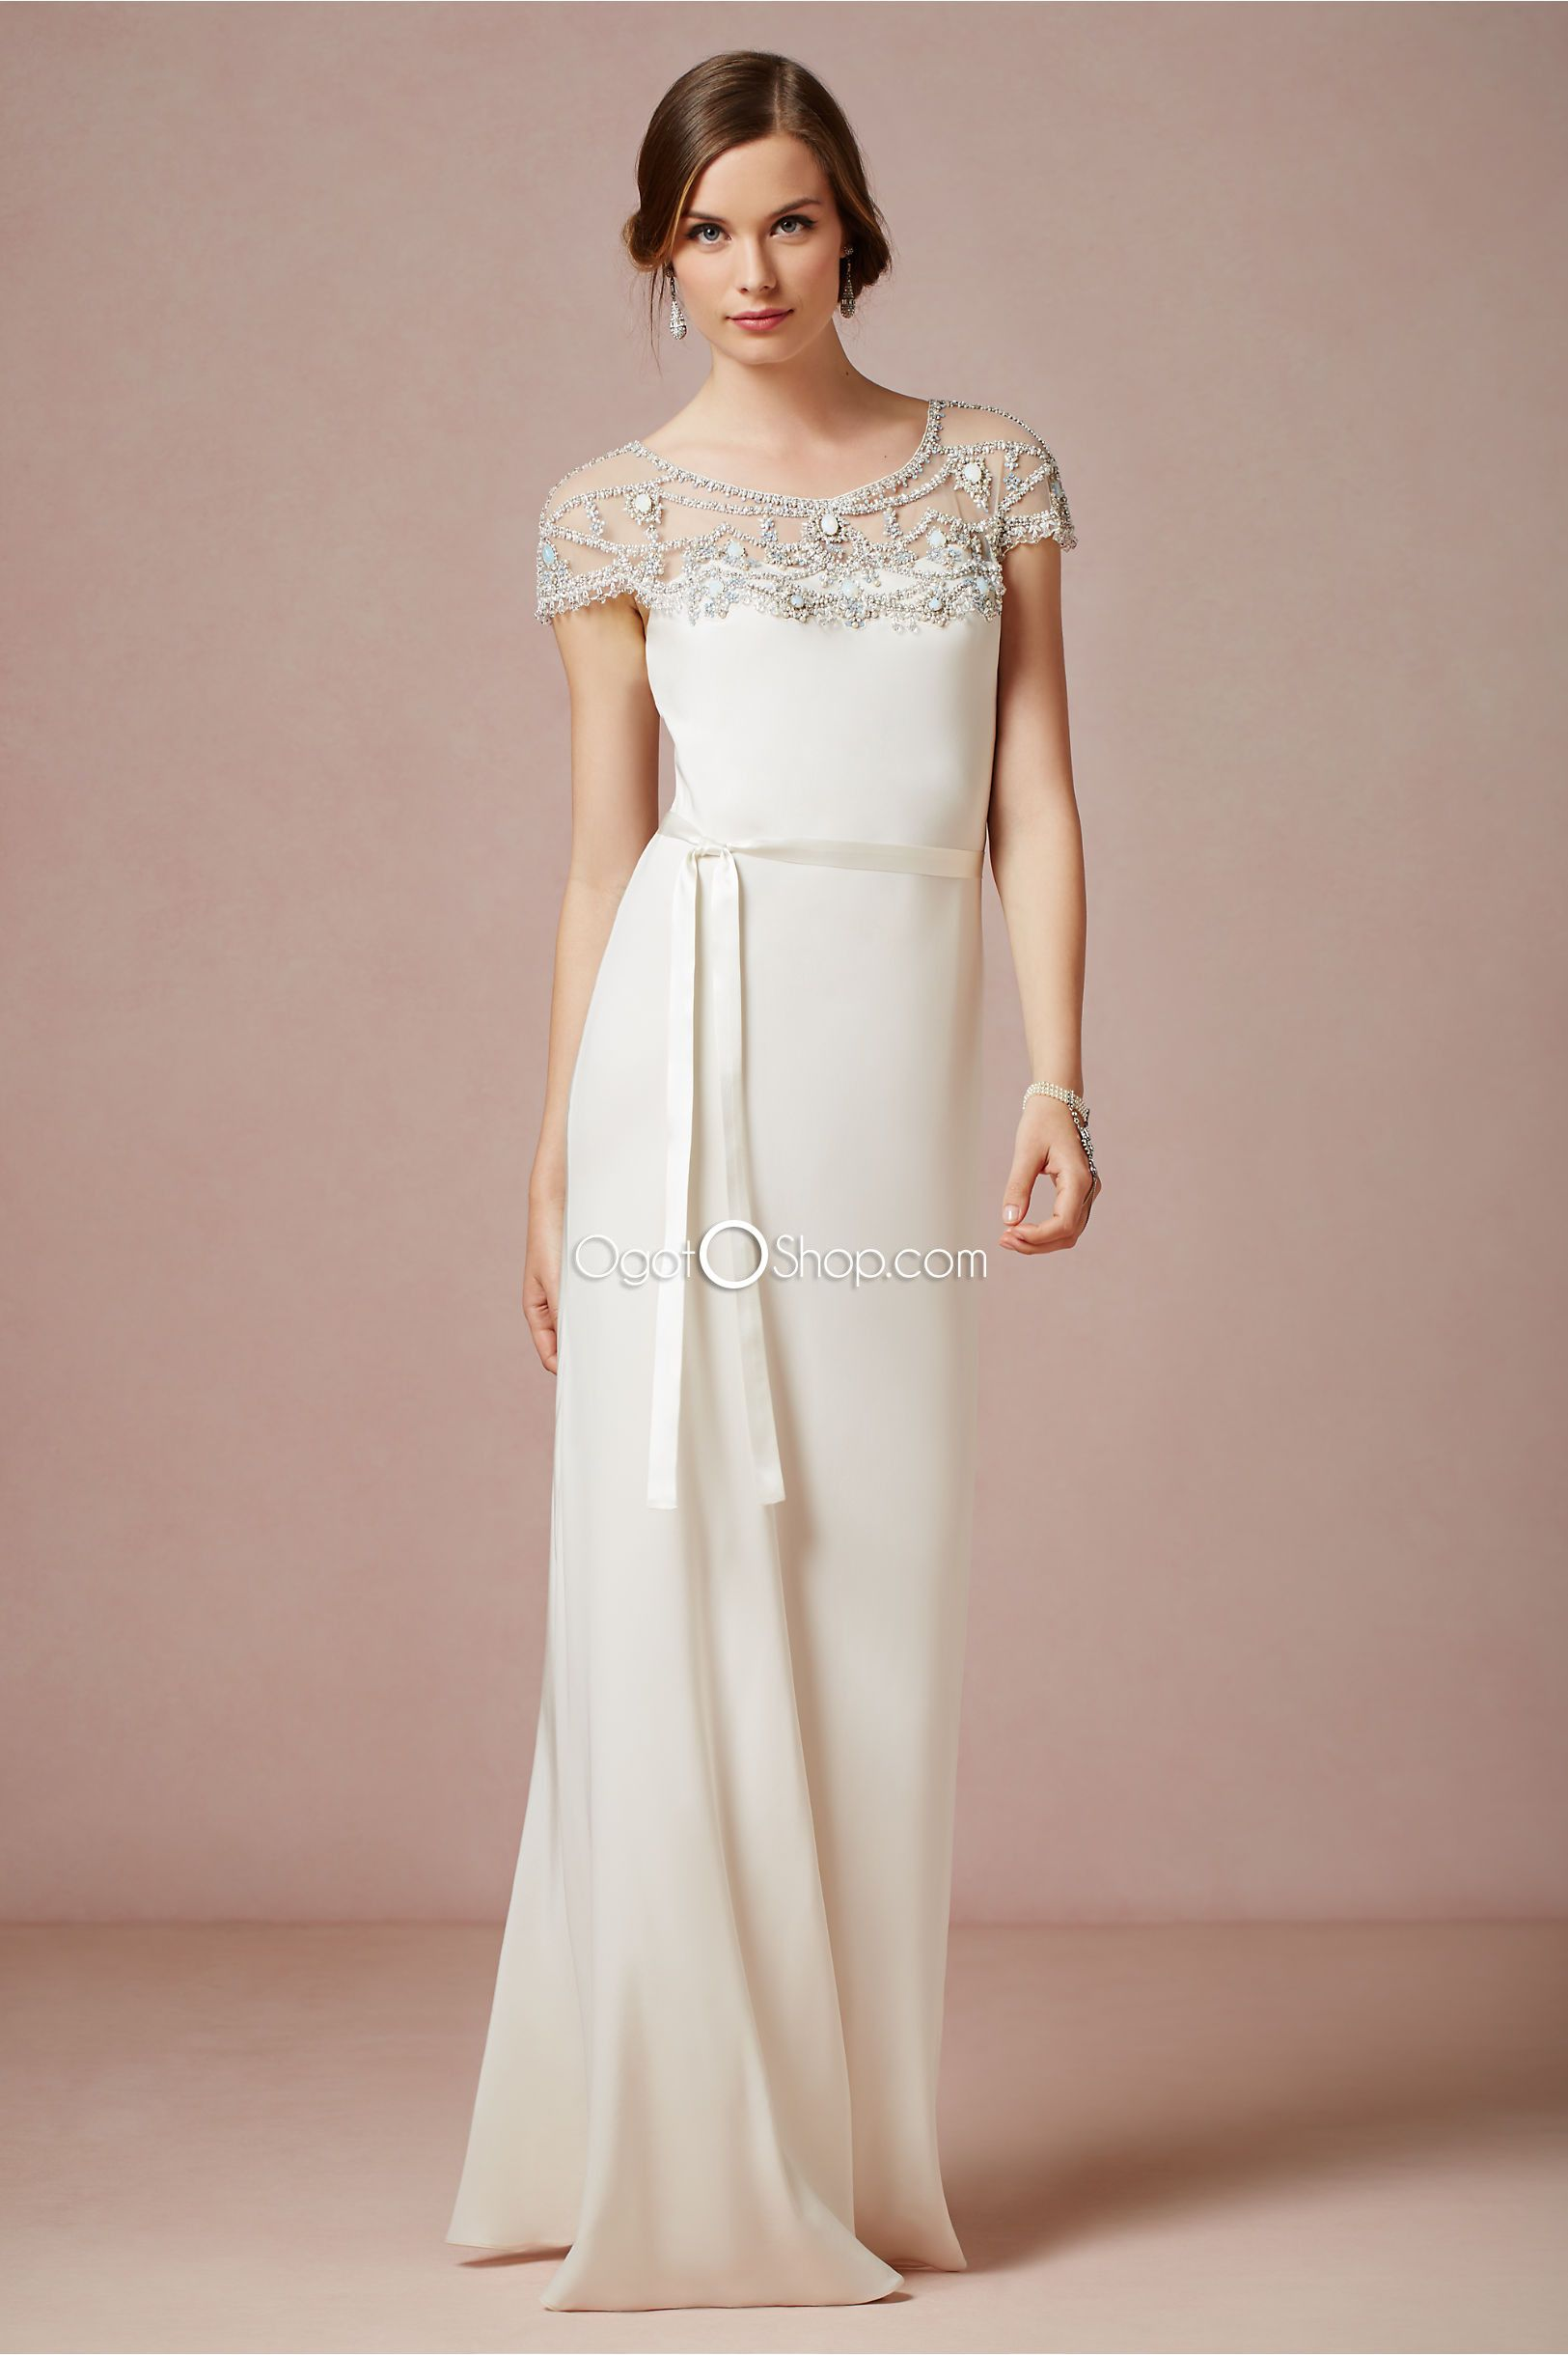 Bridal wedding dresses  Gorgeousjewelnecklinewhitesheathweddingdressesinfloorlength